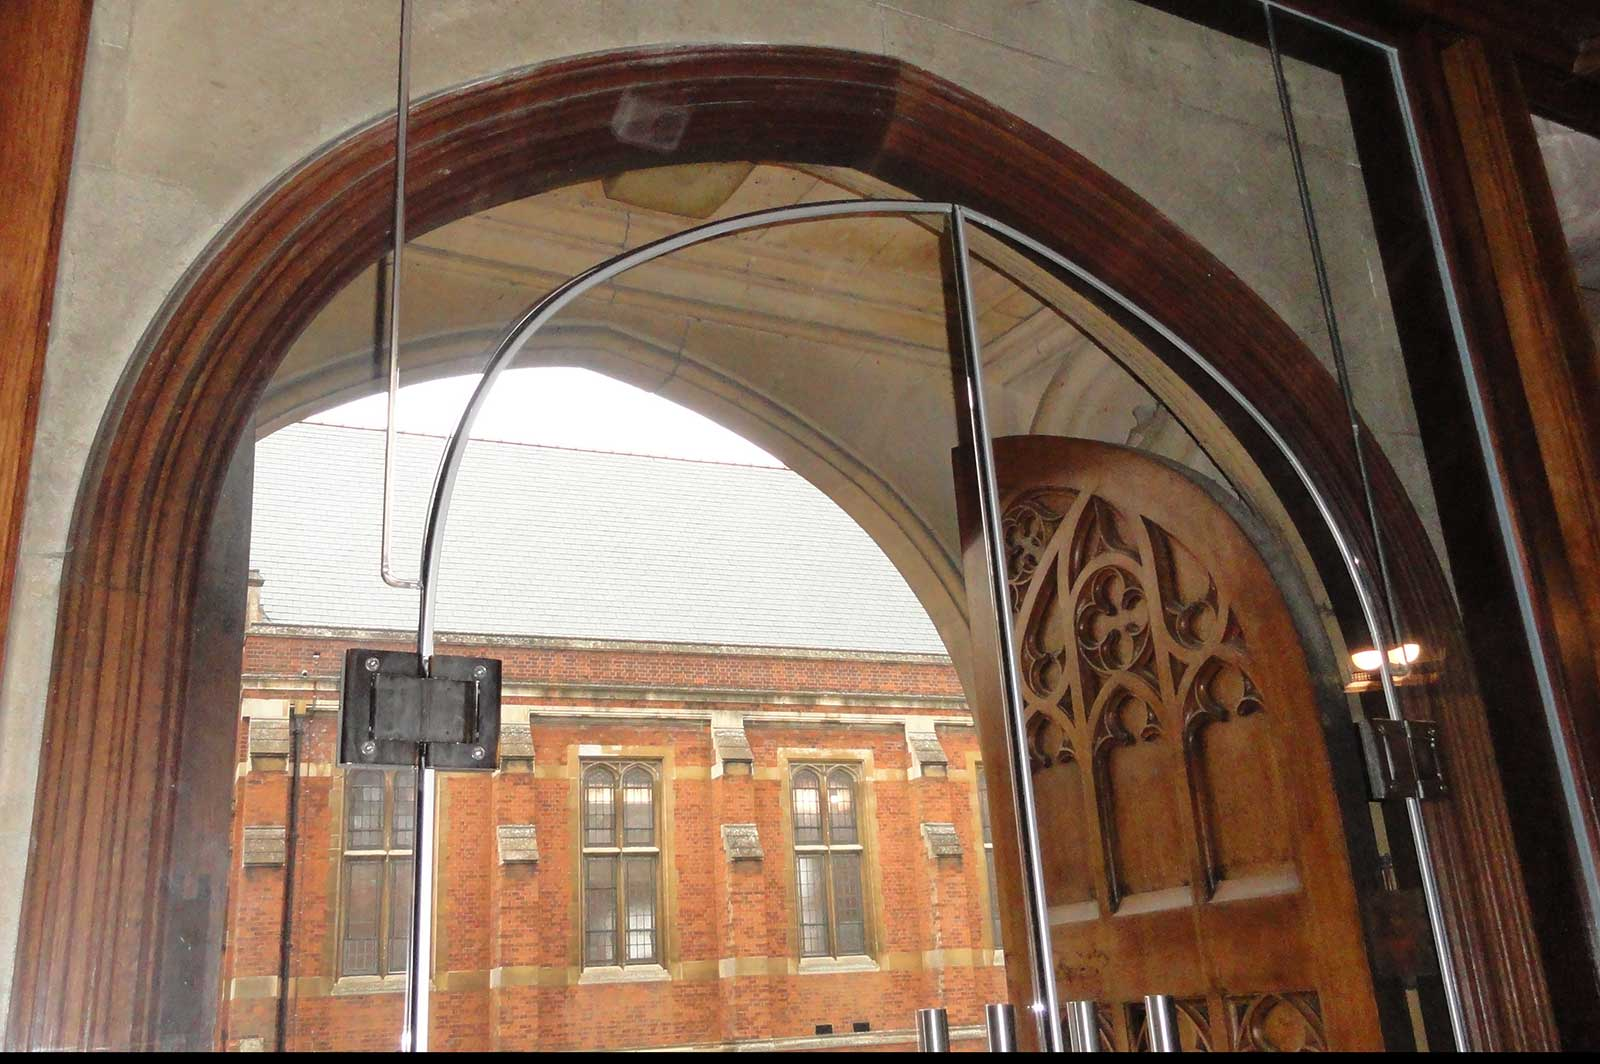 Bespoke Arch Shaped Glass Doors, The Leys School